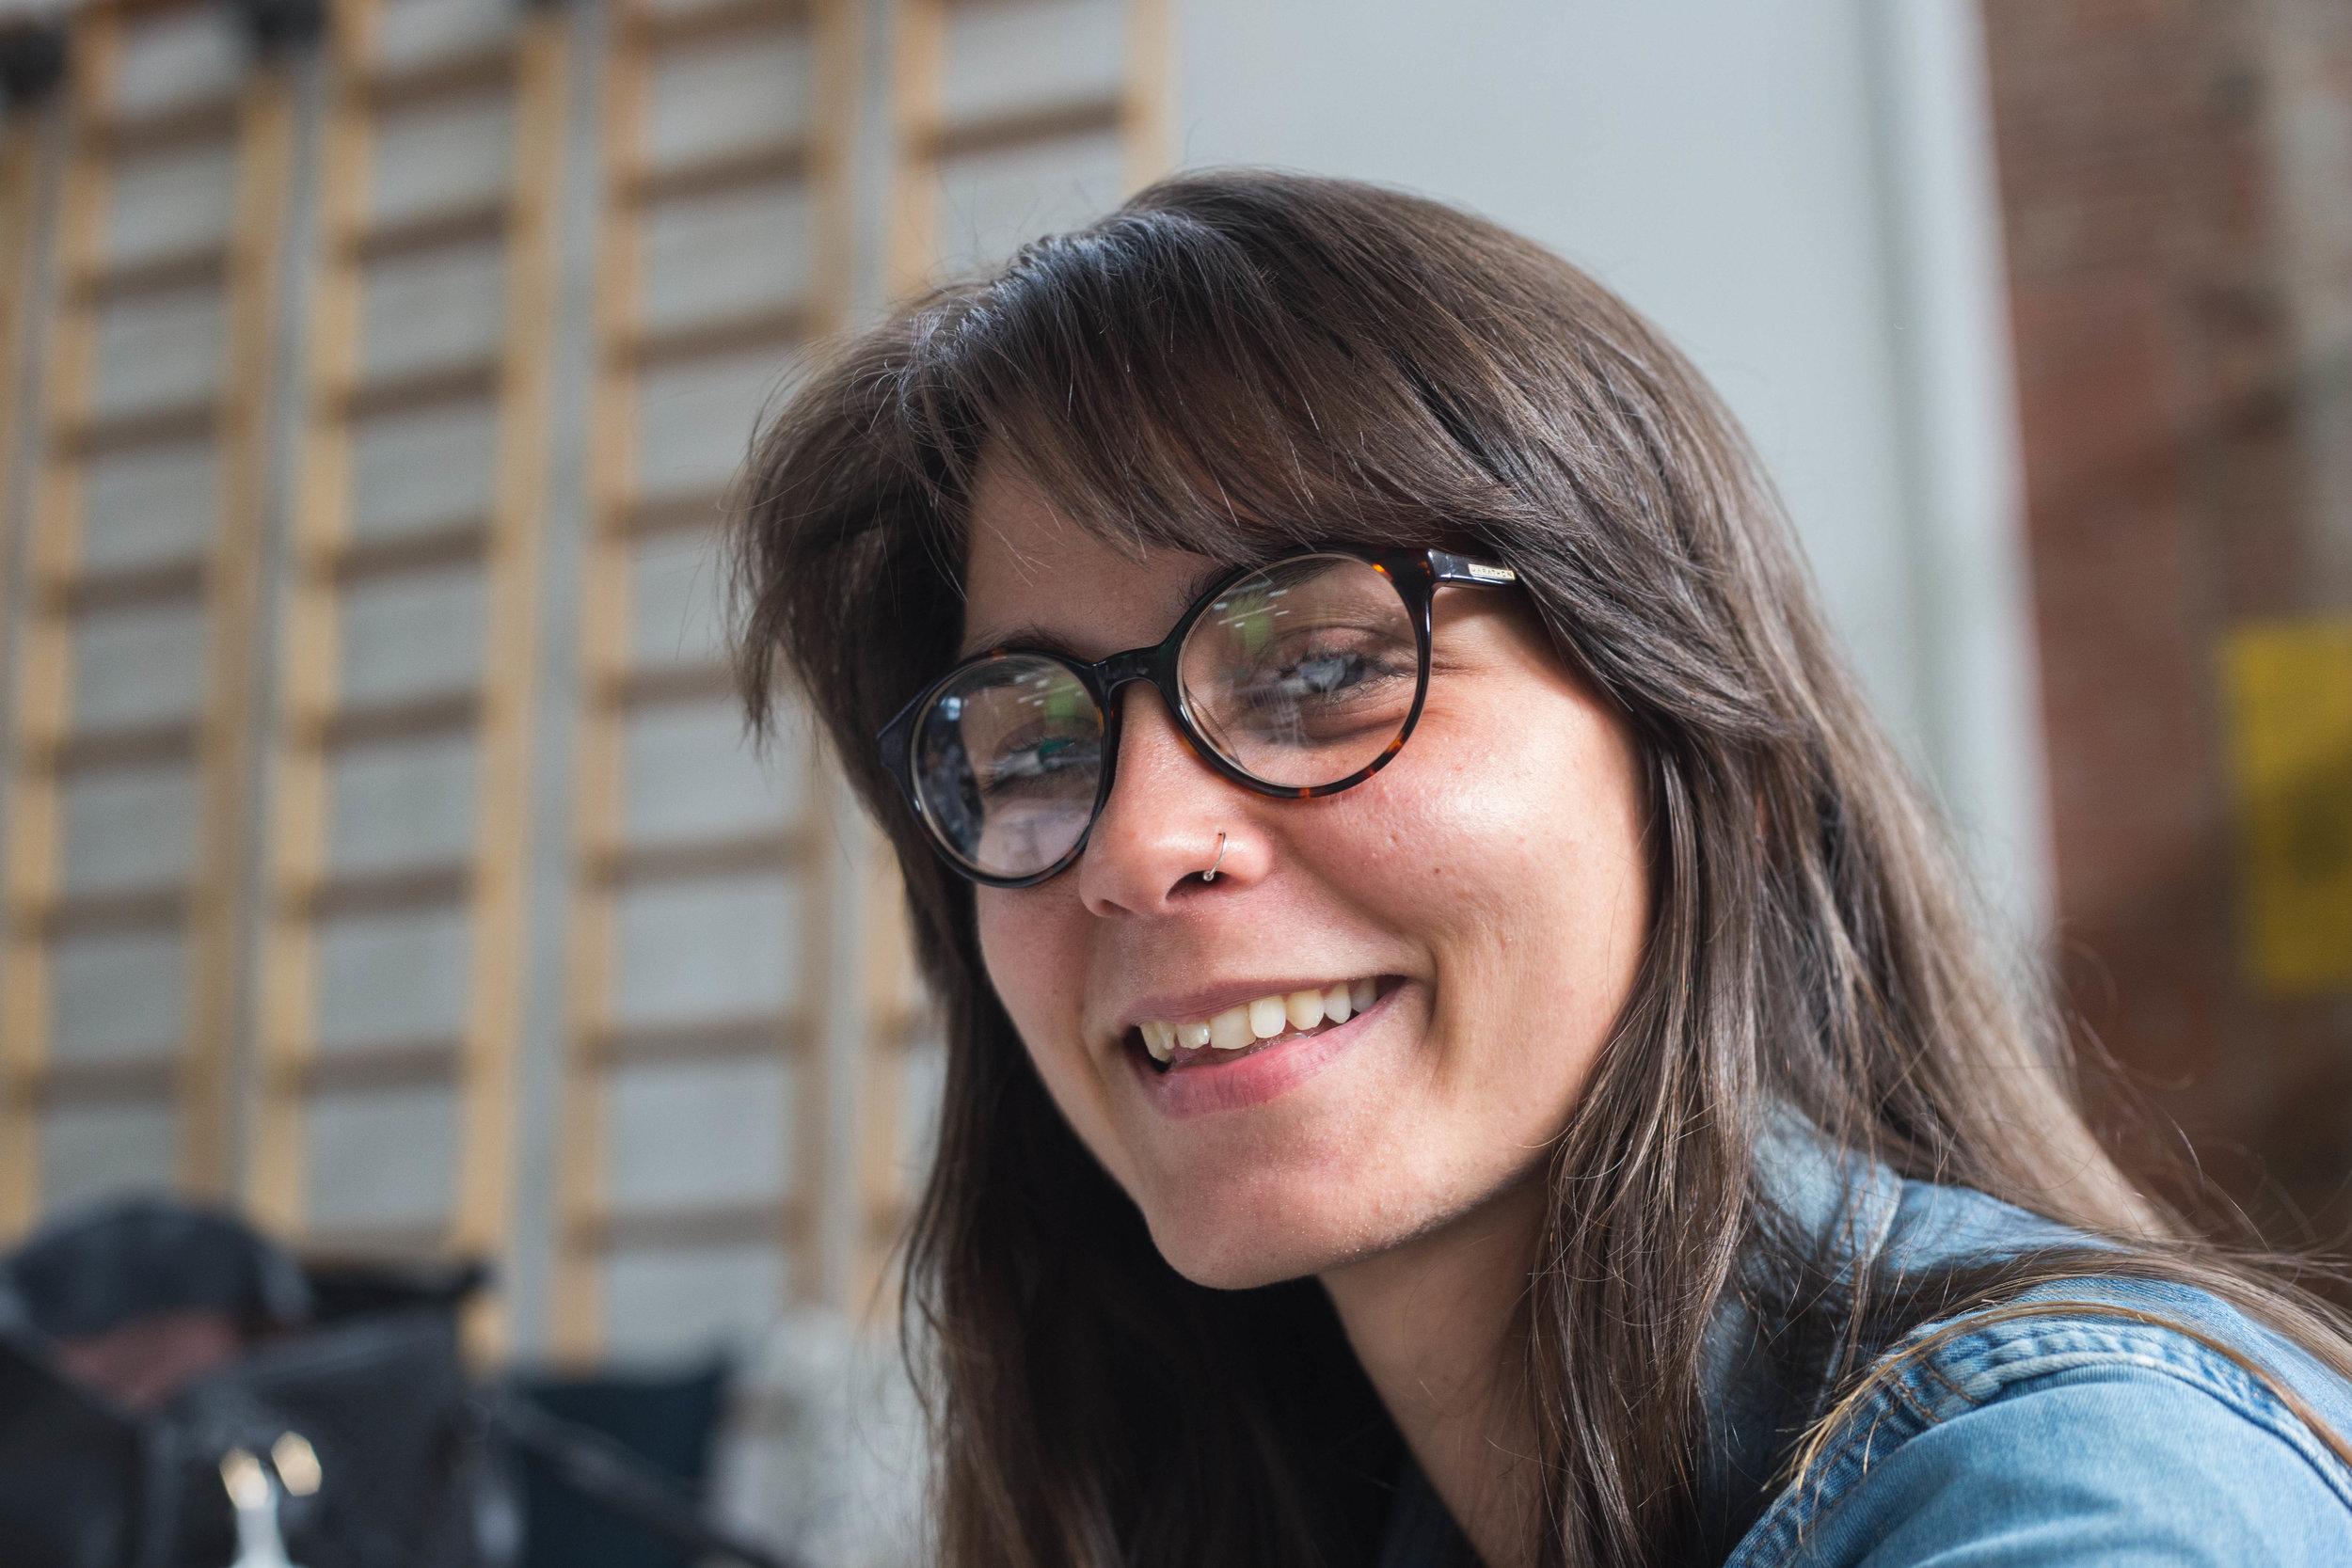 Cynthia Garit from Clandestina